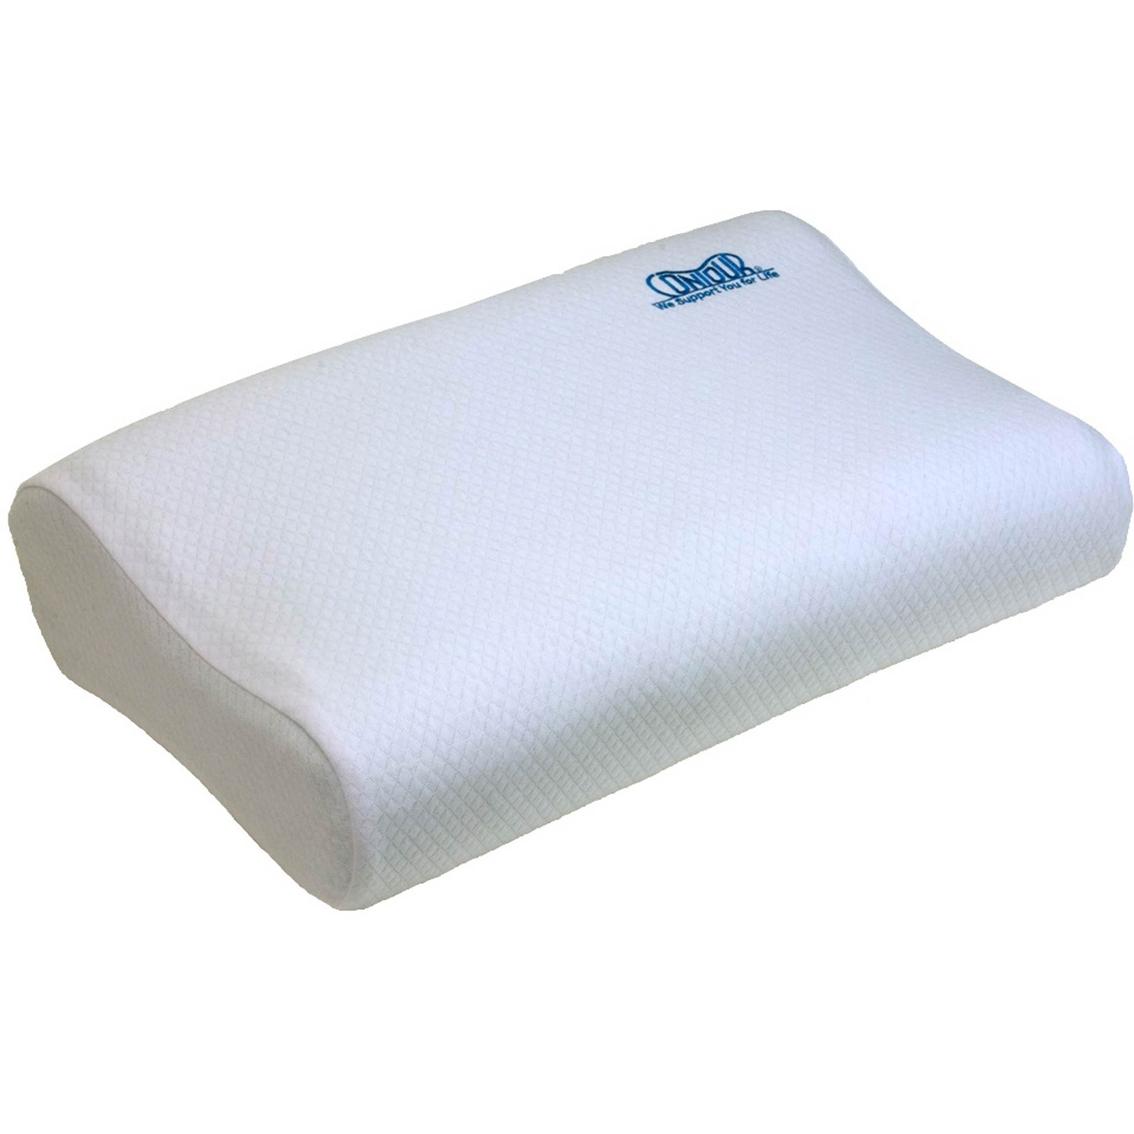 Contour Cloud Cool Air Pillow  Bed Pillows  Home